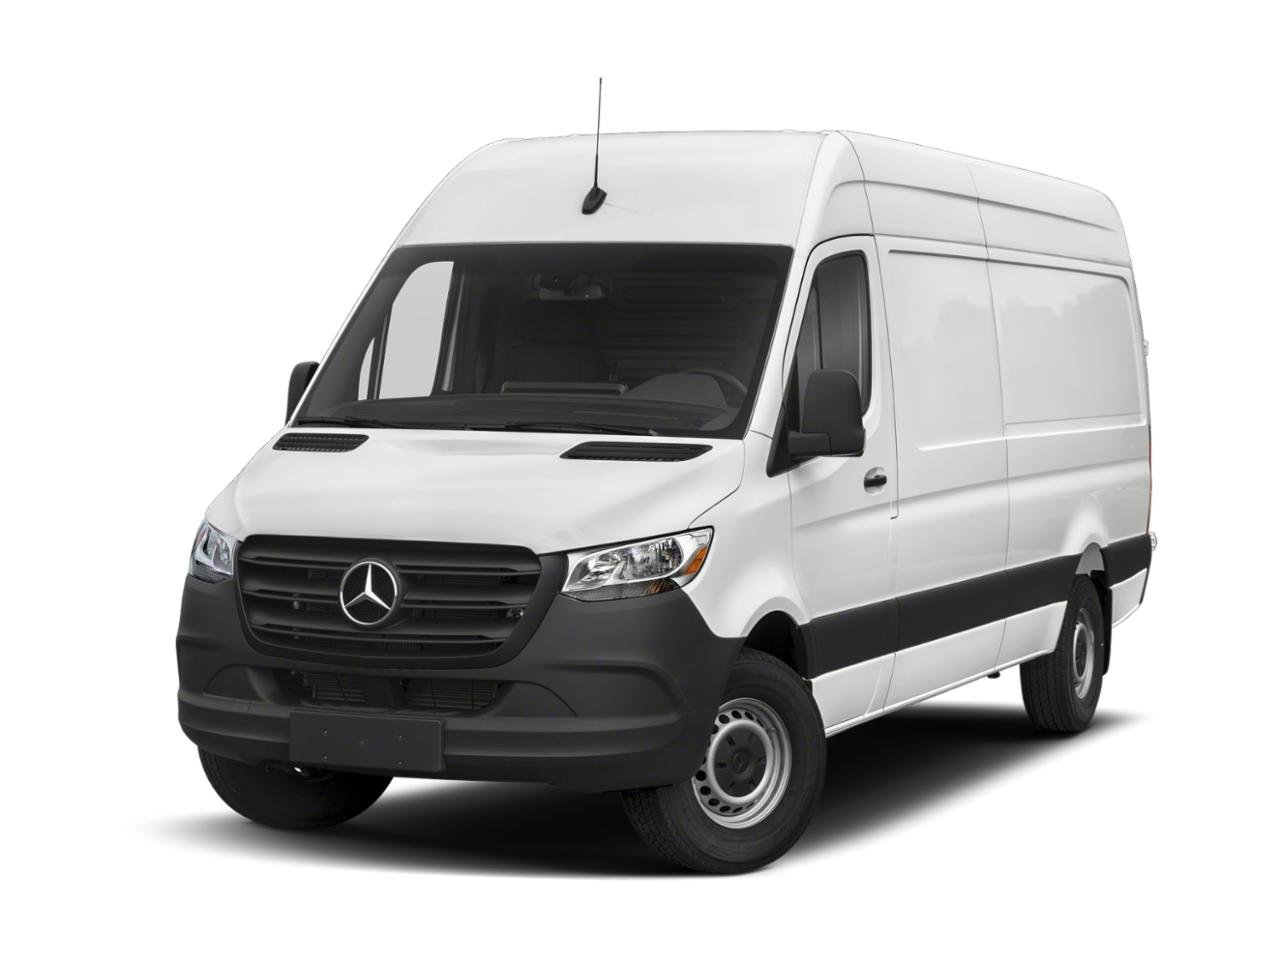 2021 Mercedes-Benz Sprinter Cargo Van Vehicle Photo in Houston, TX 77079